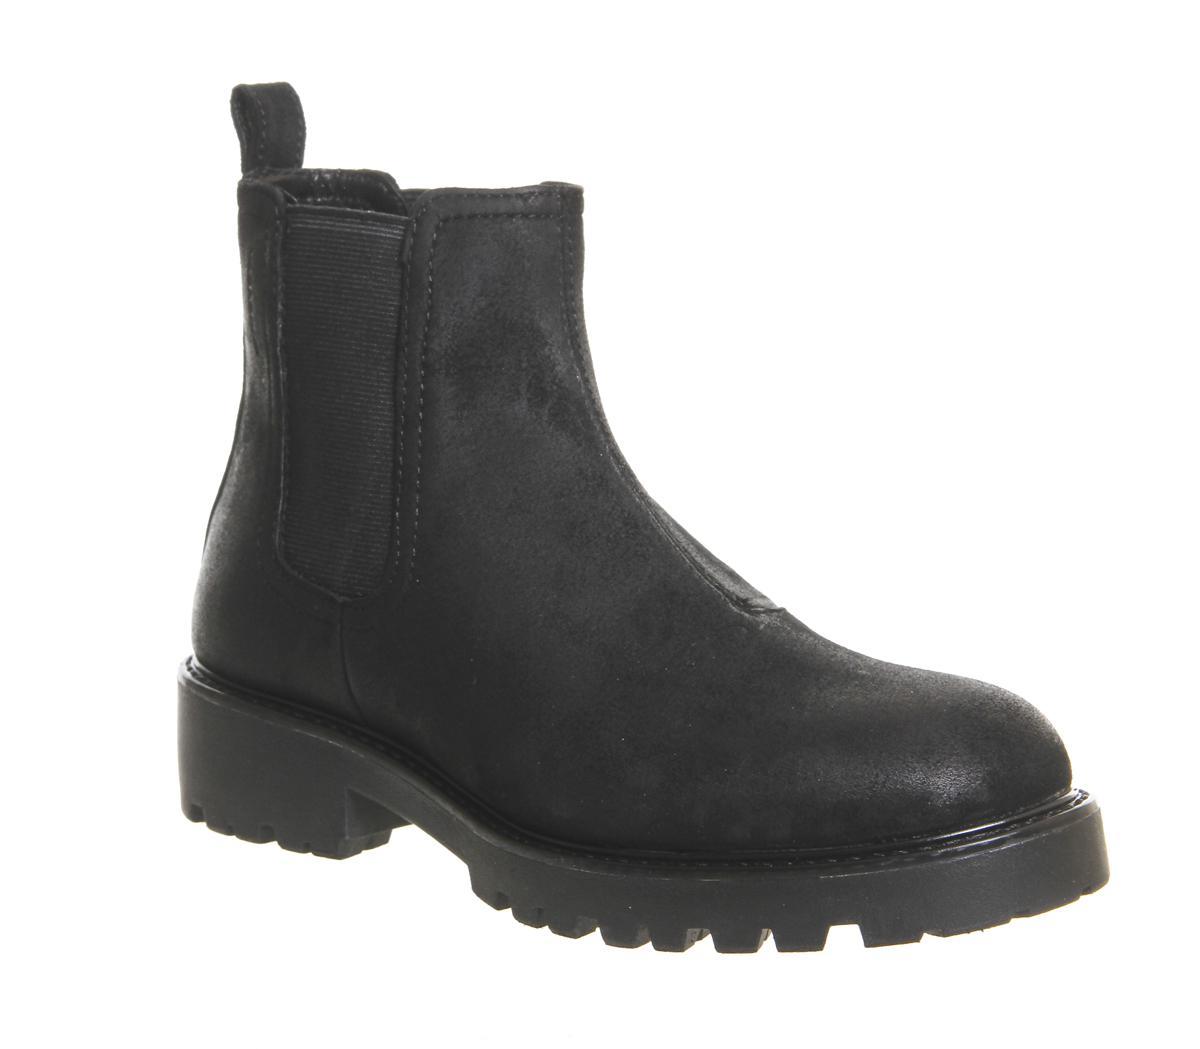 Vagabond Suede Kenova Chelsea Boots in Black